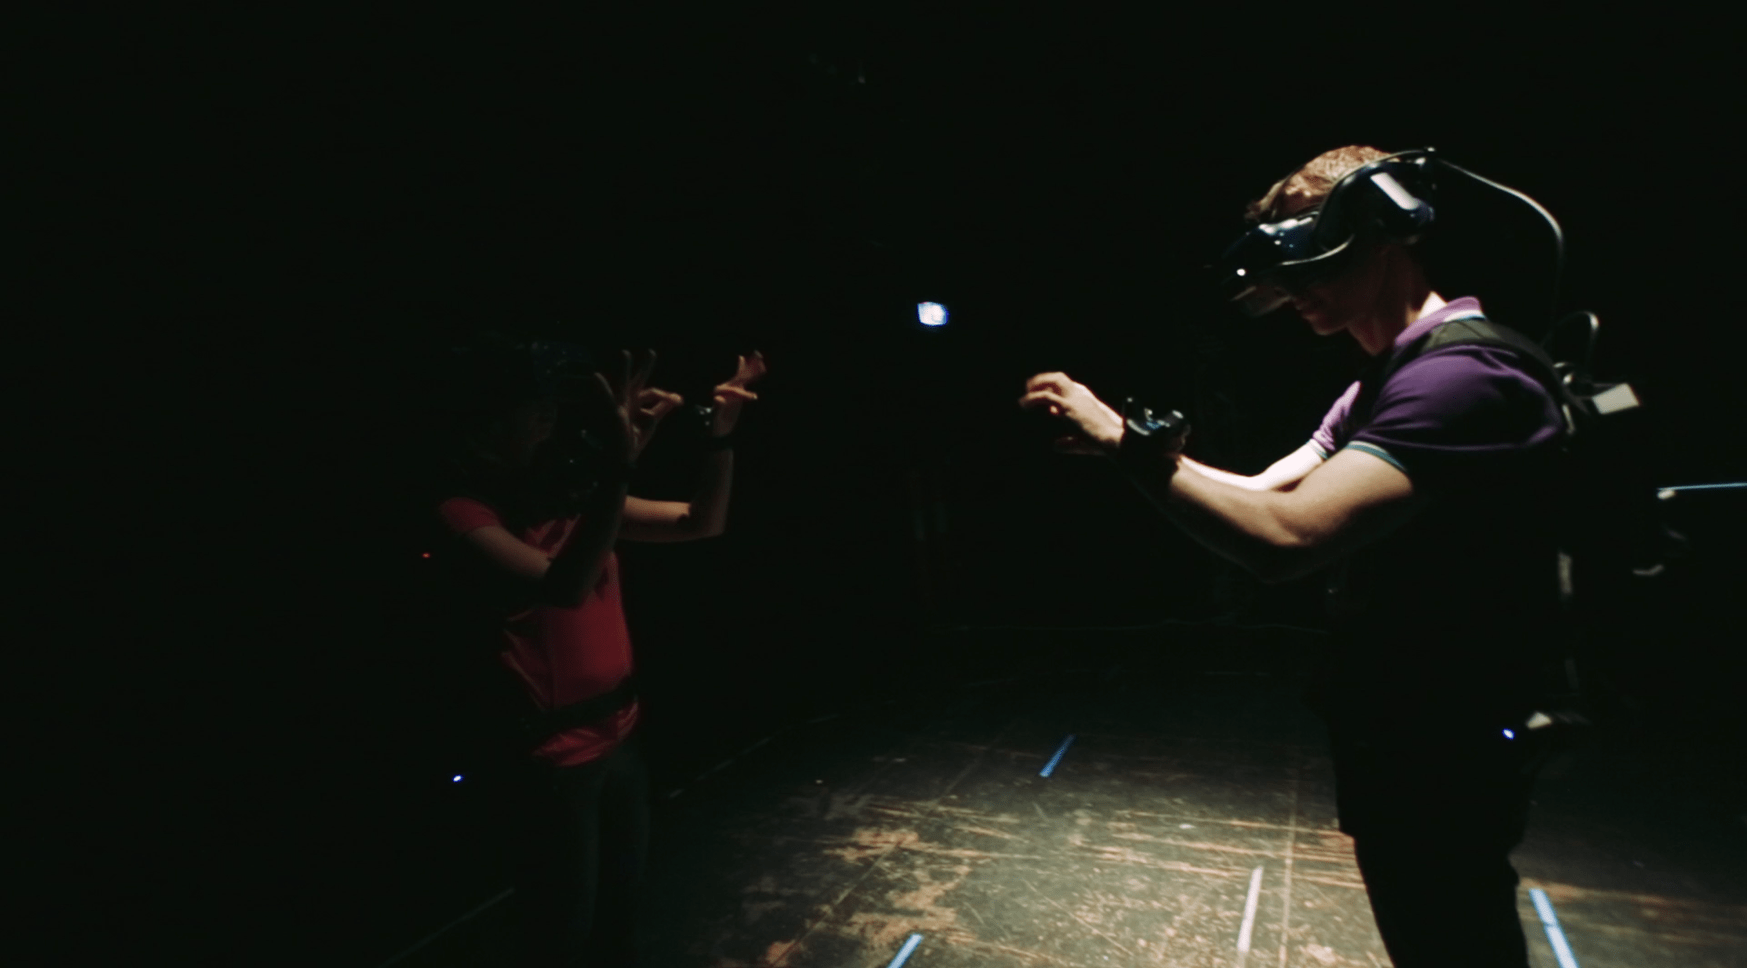 Reality vs Virtual 1